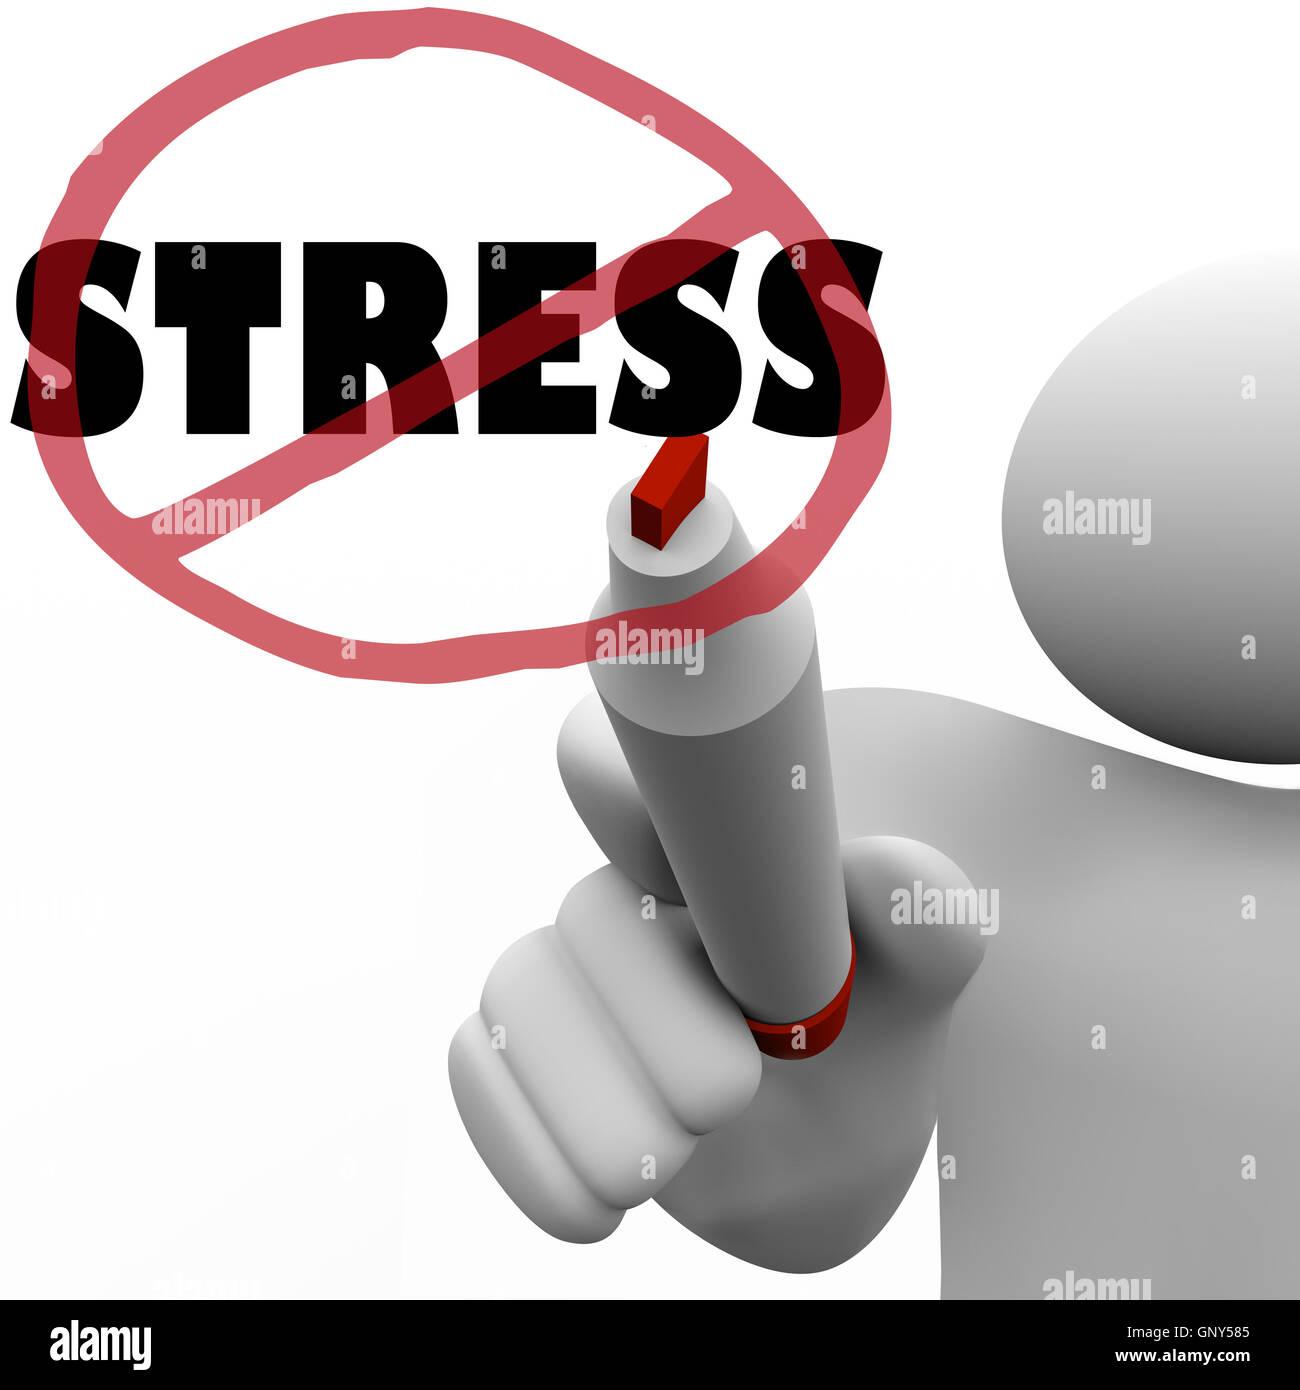 No Stress Man Draws Slash to Reduce Stressful Anxiety - Stock Image